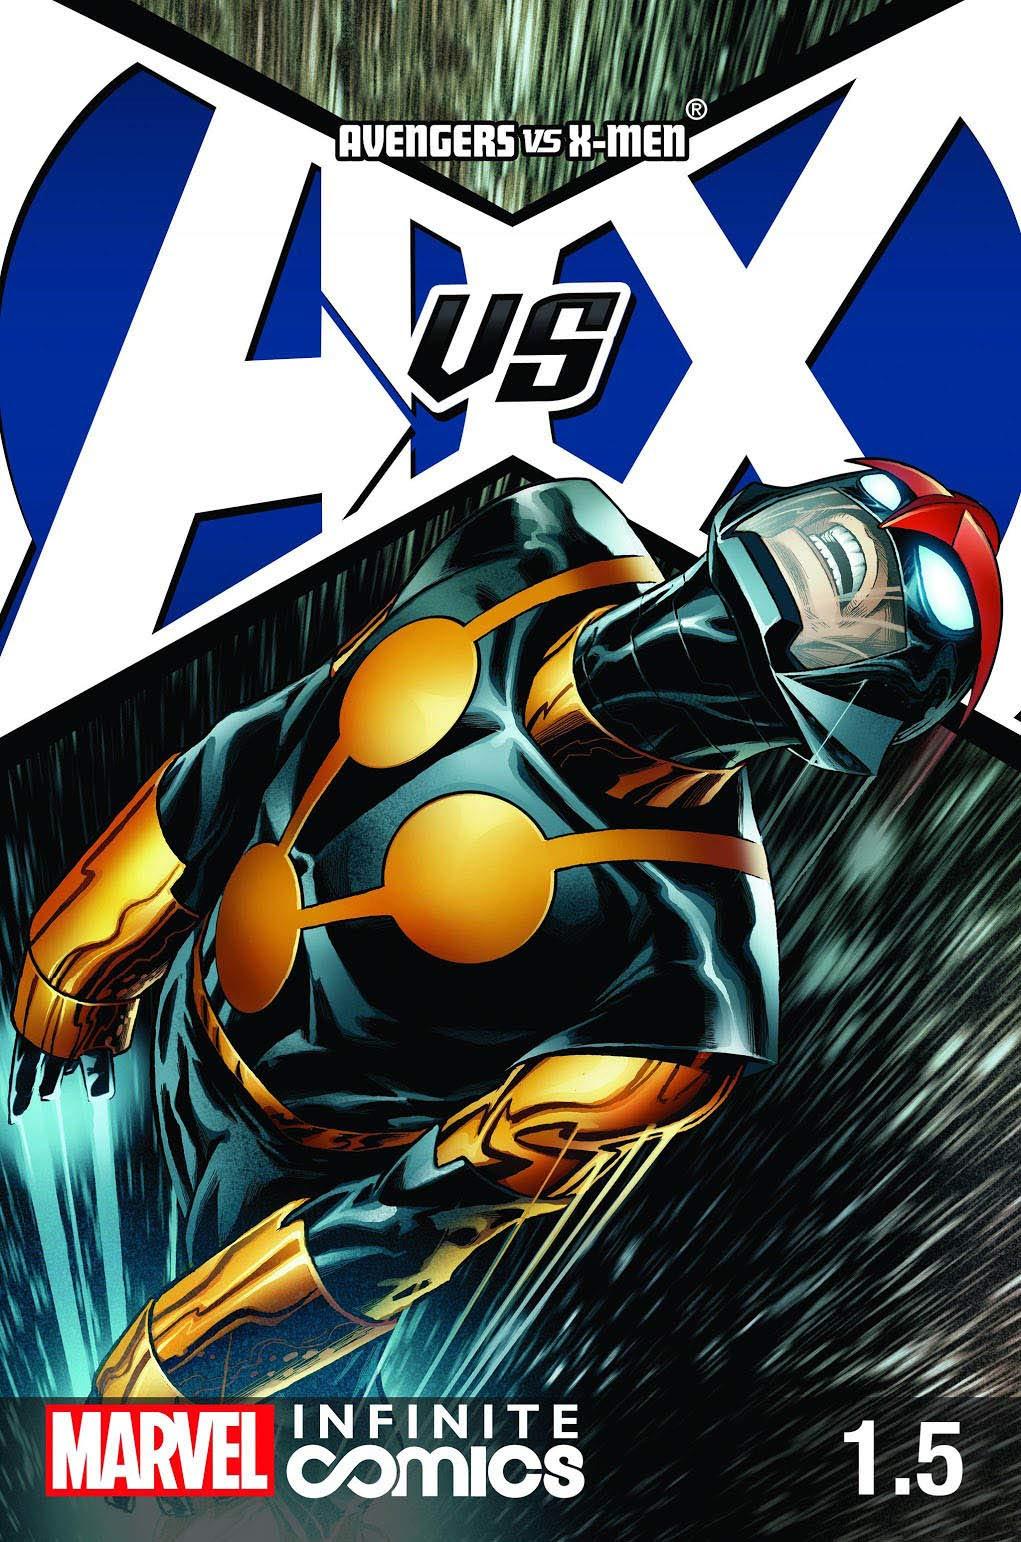 Comic Book: Avengers vs X-Men Infinite